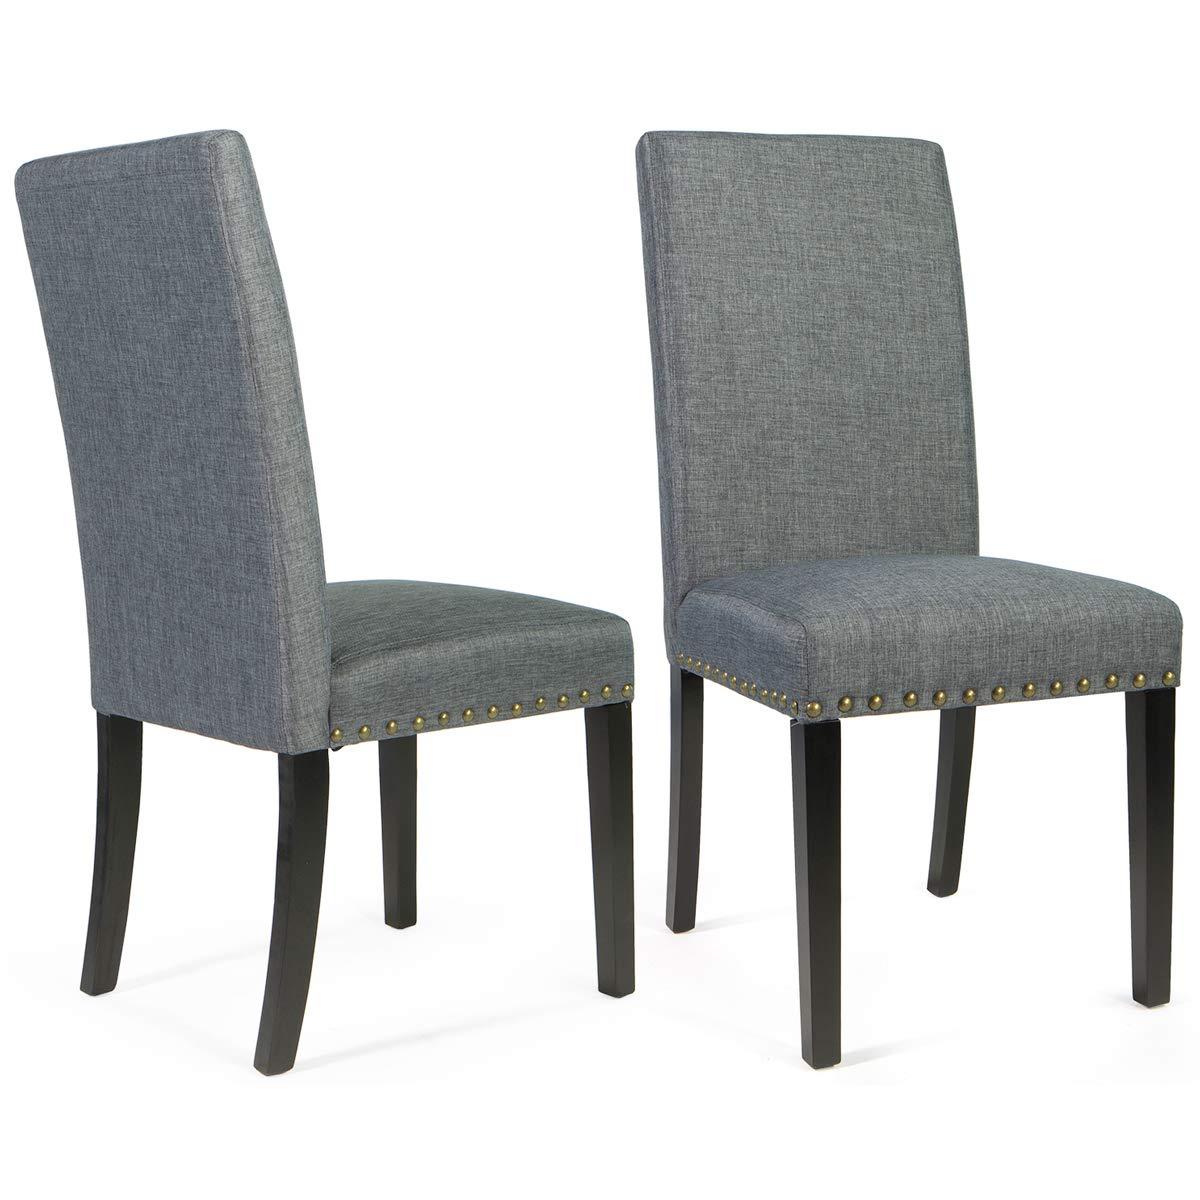 Barton Fabric Stylish Dining Chair Furniture with Nailhead Trim, Set of 2, Grey Medium